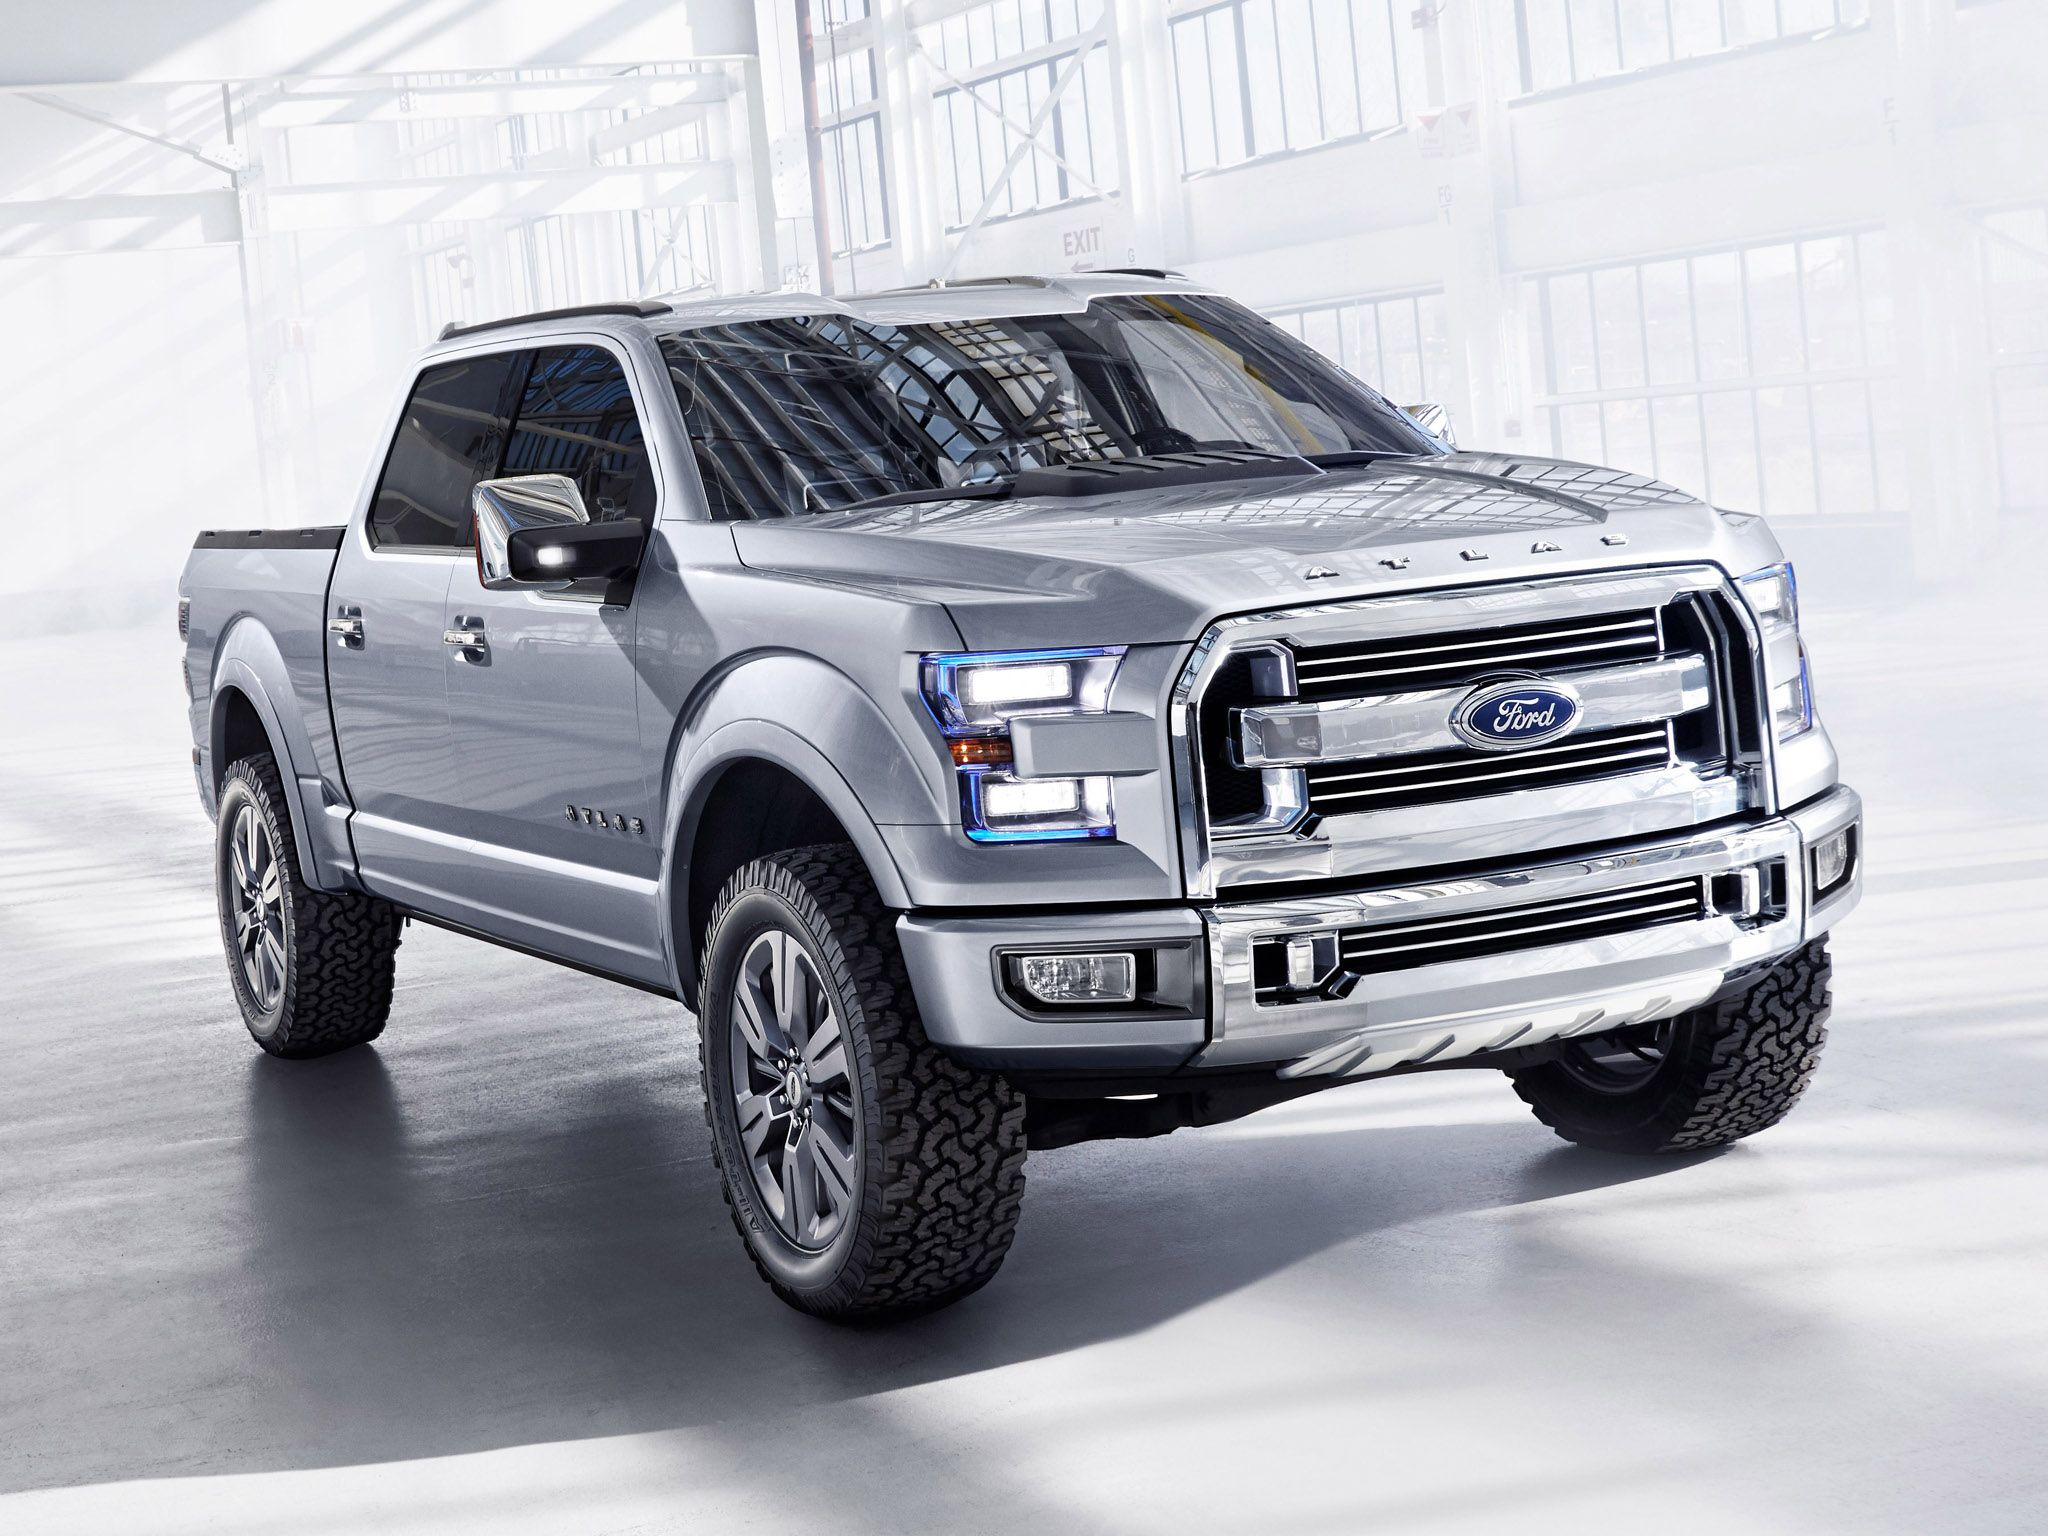 2013 Ford Atlas Concept truck wallpaper 2048x1536